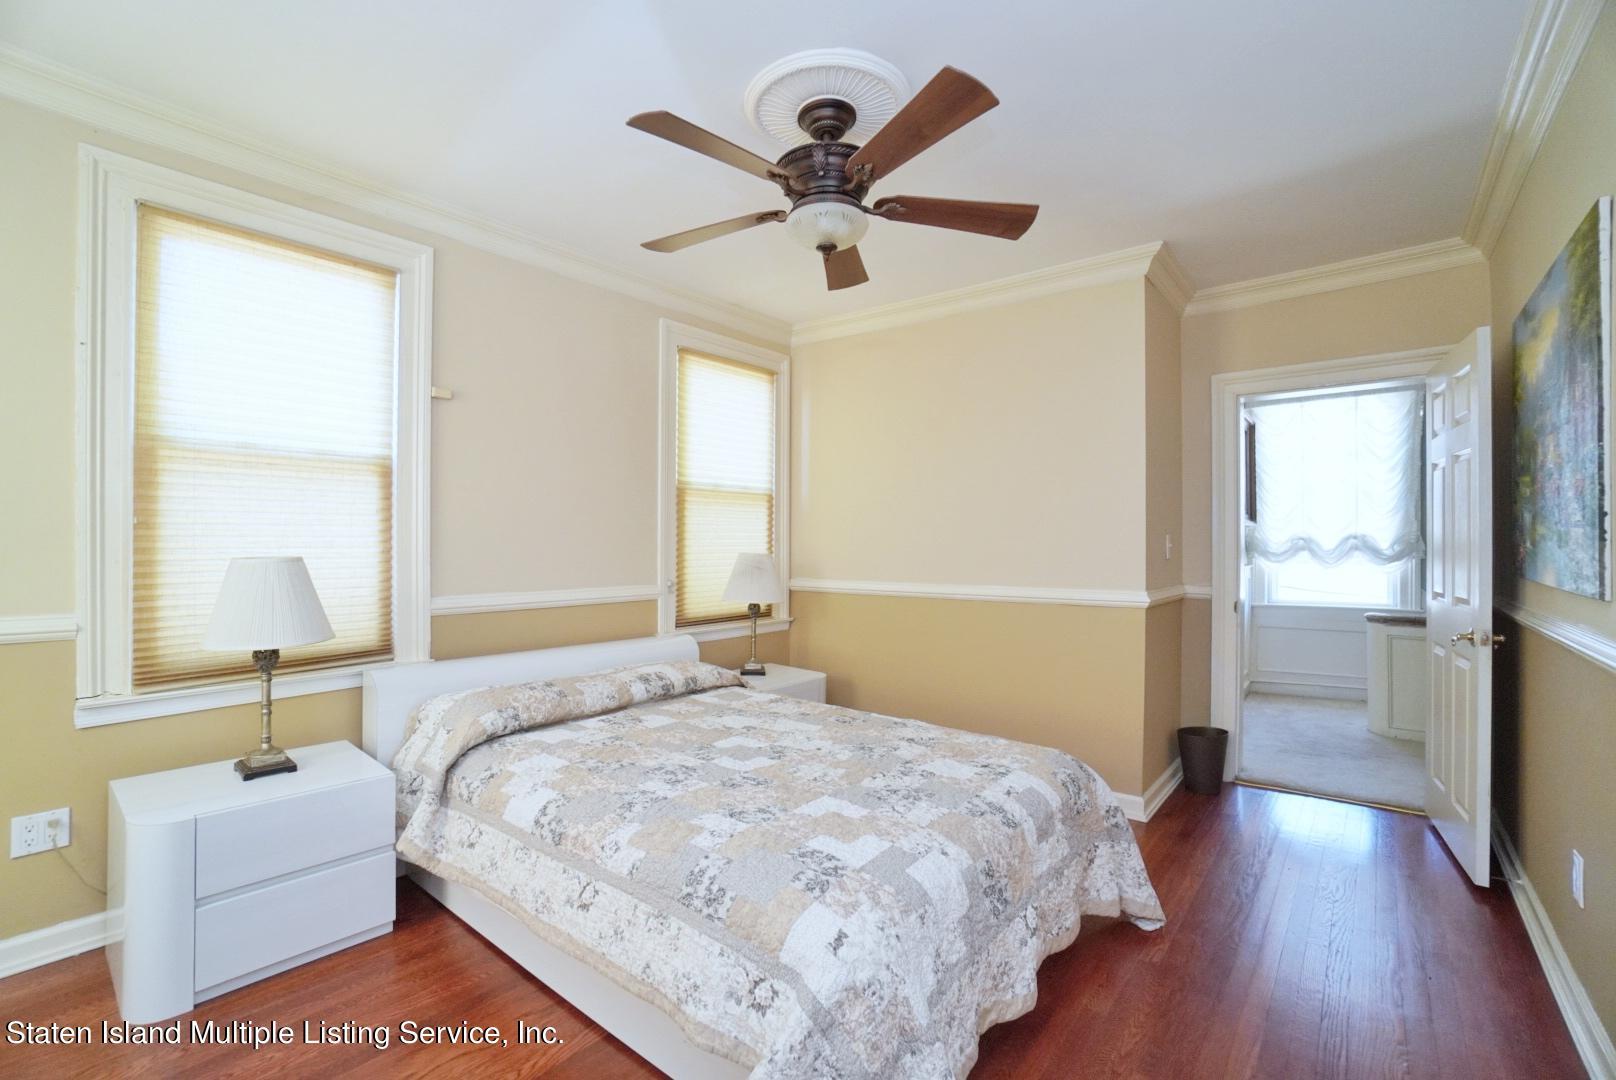 Single Family - Detached 264 Fisher Avenue  Staten Island, NY 10307, MLS-1146898-36